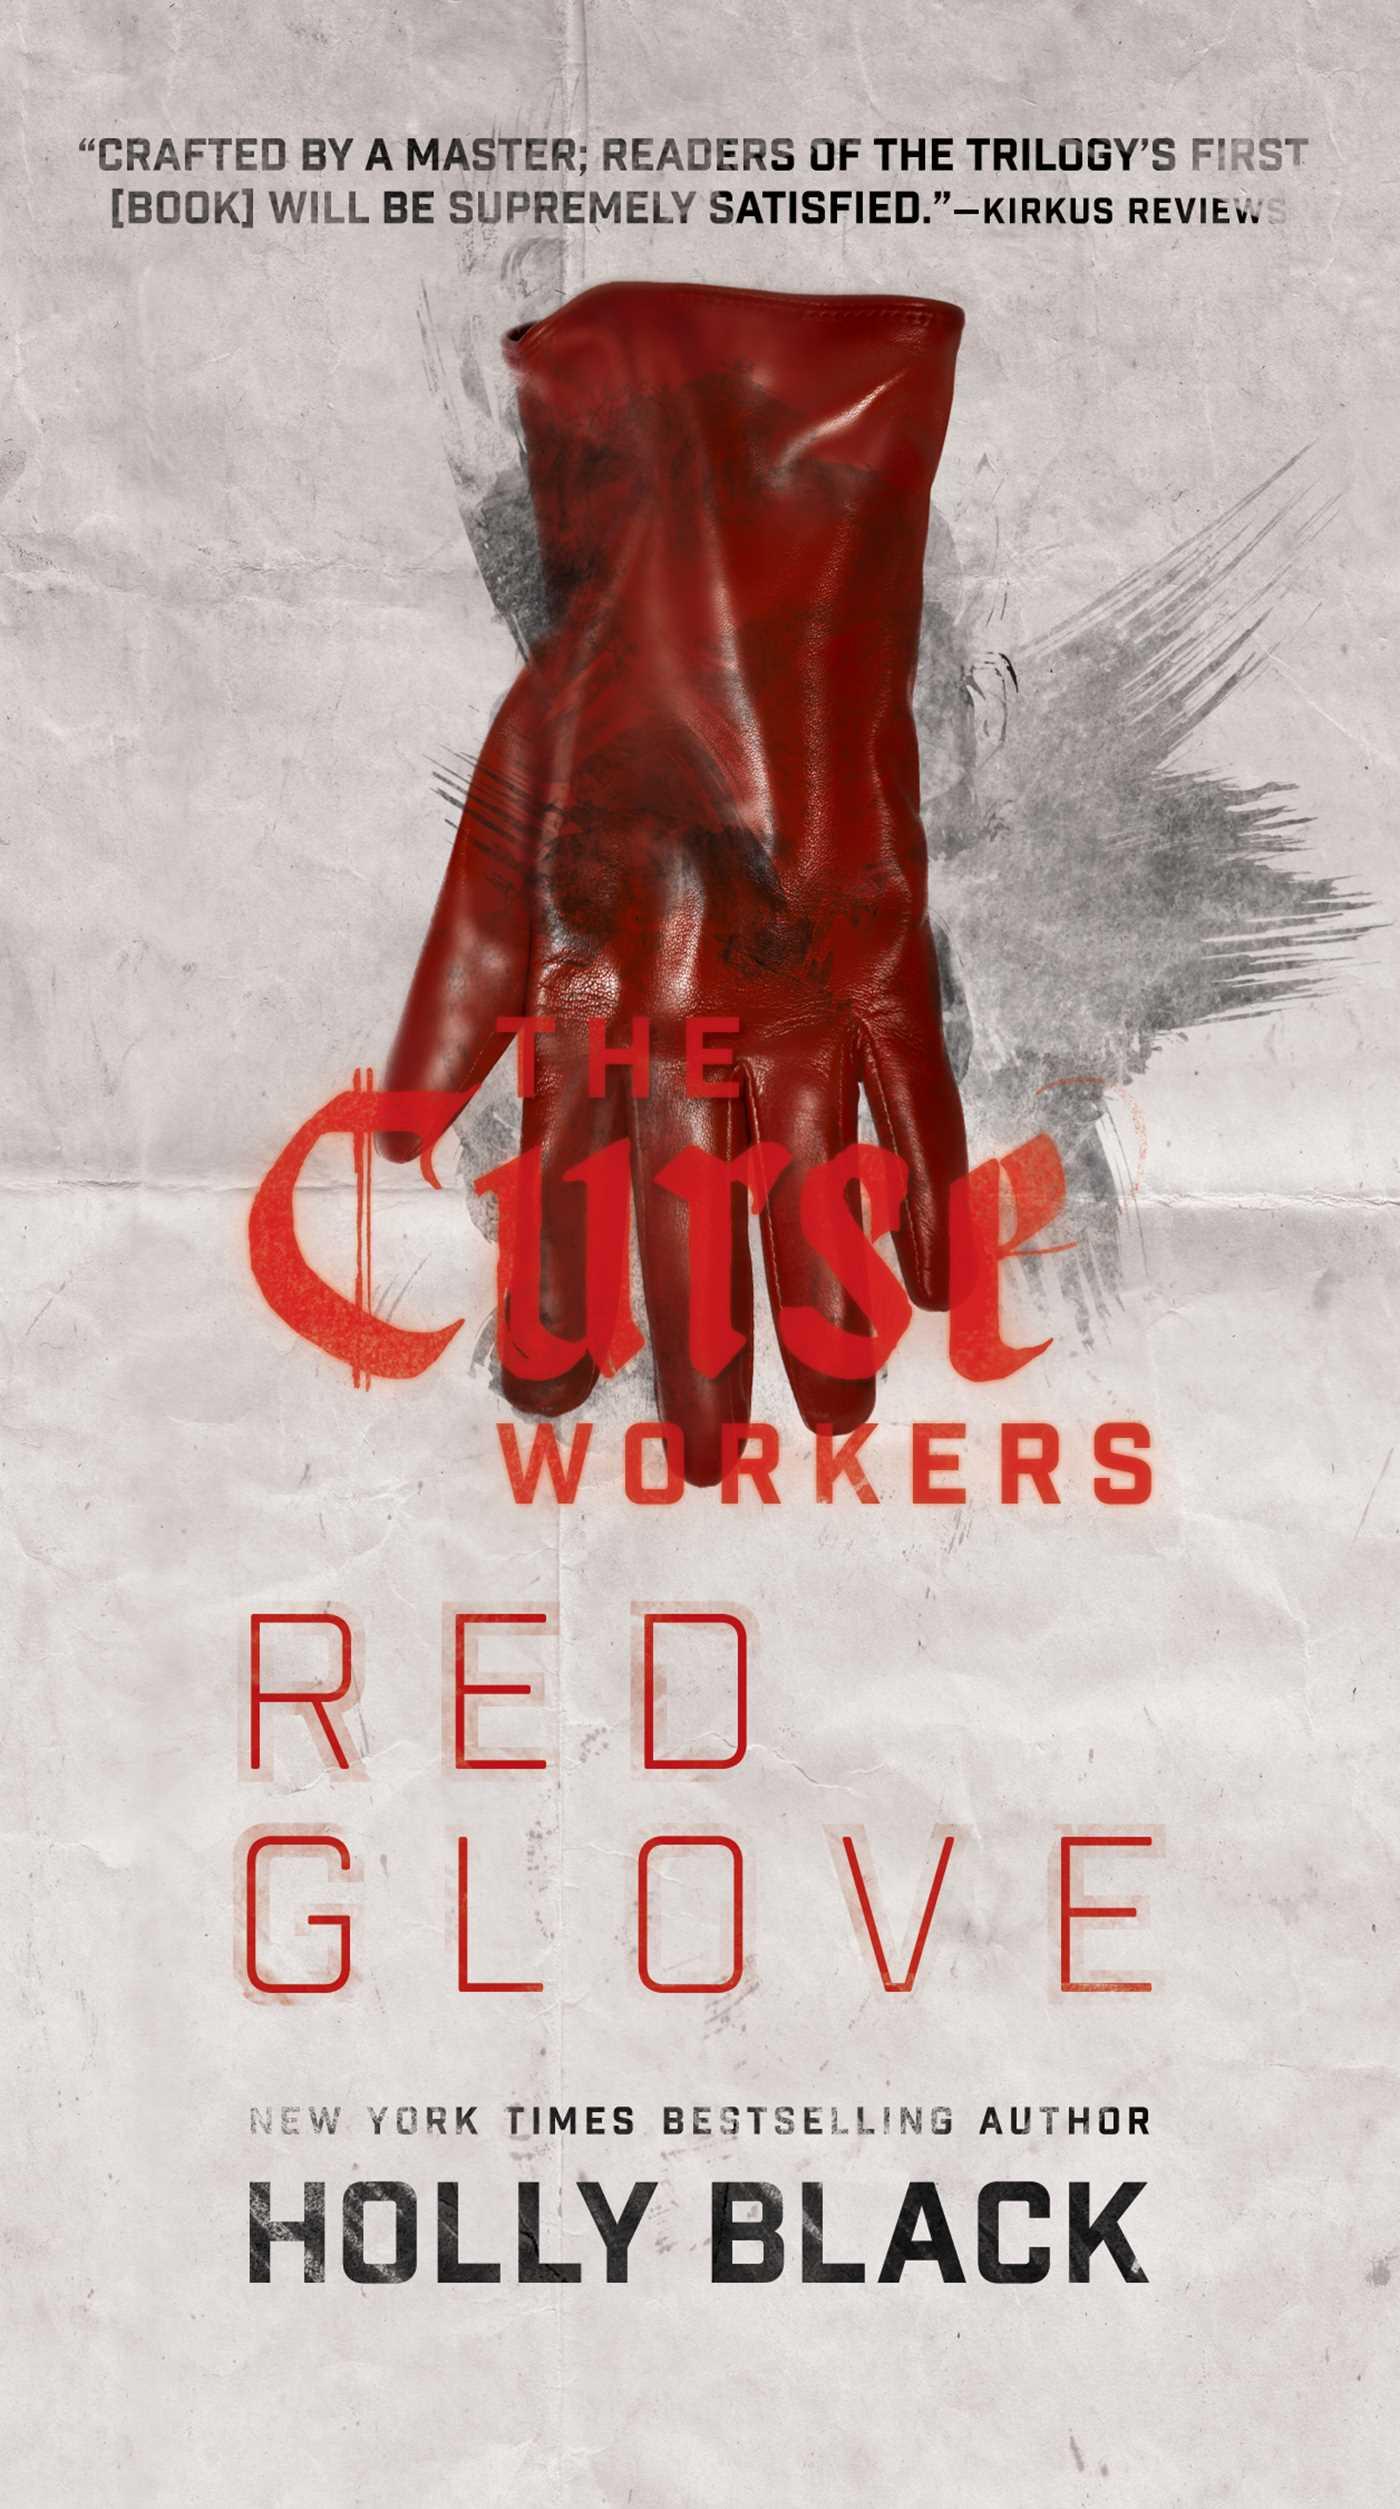 holly-black-red-glove.jpg